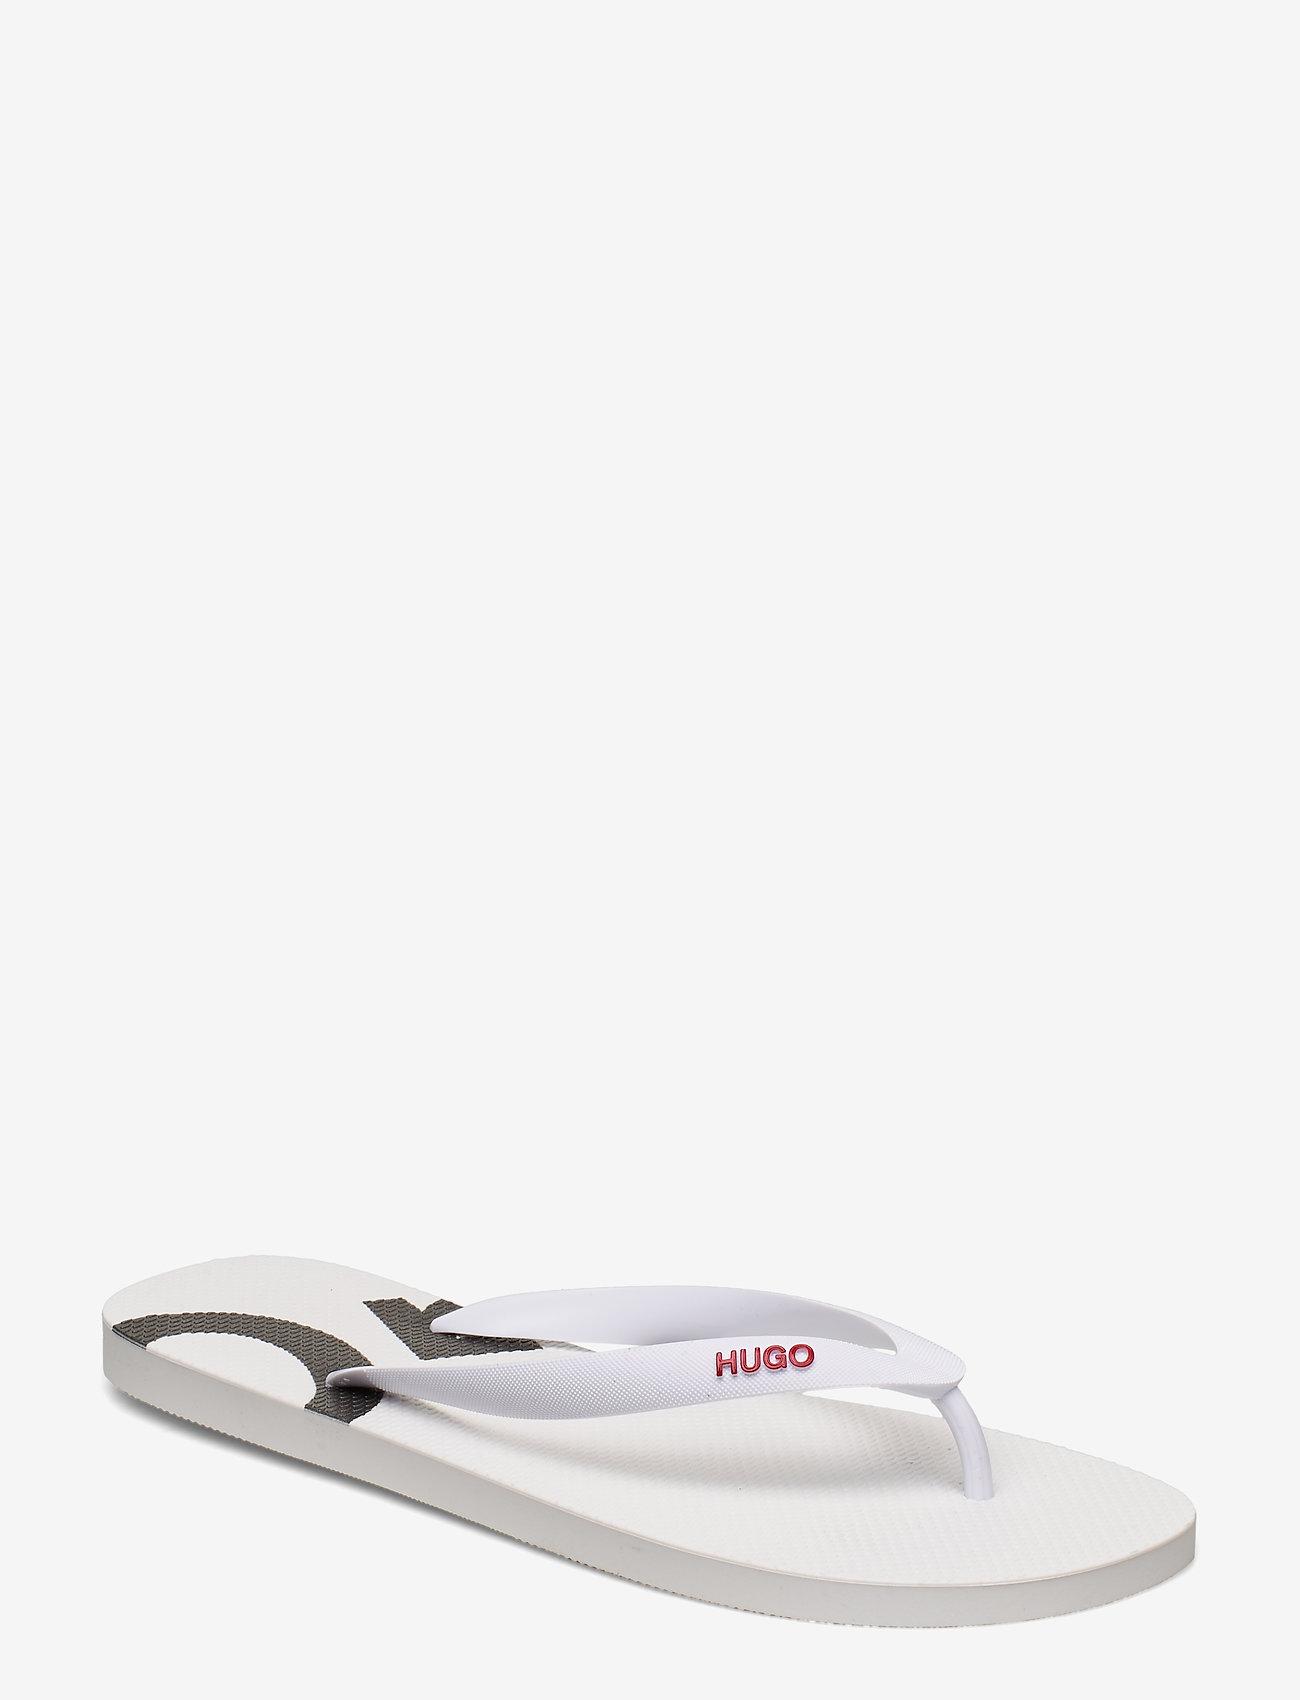 HUGO - Onfire_Thng_rblg2 - flip-flops - white - 1